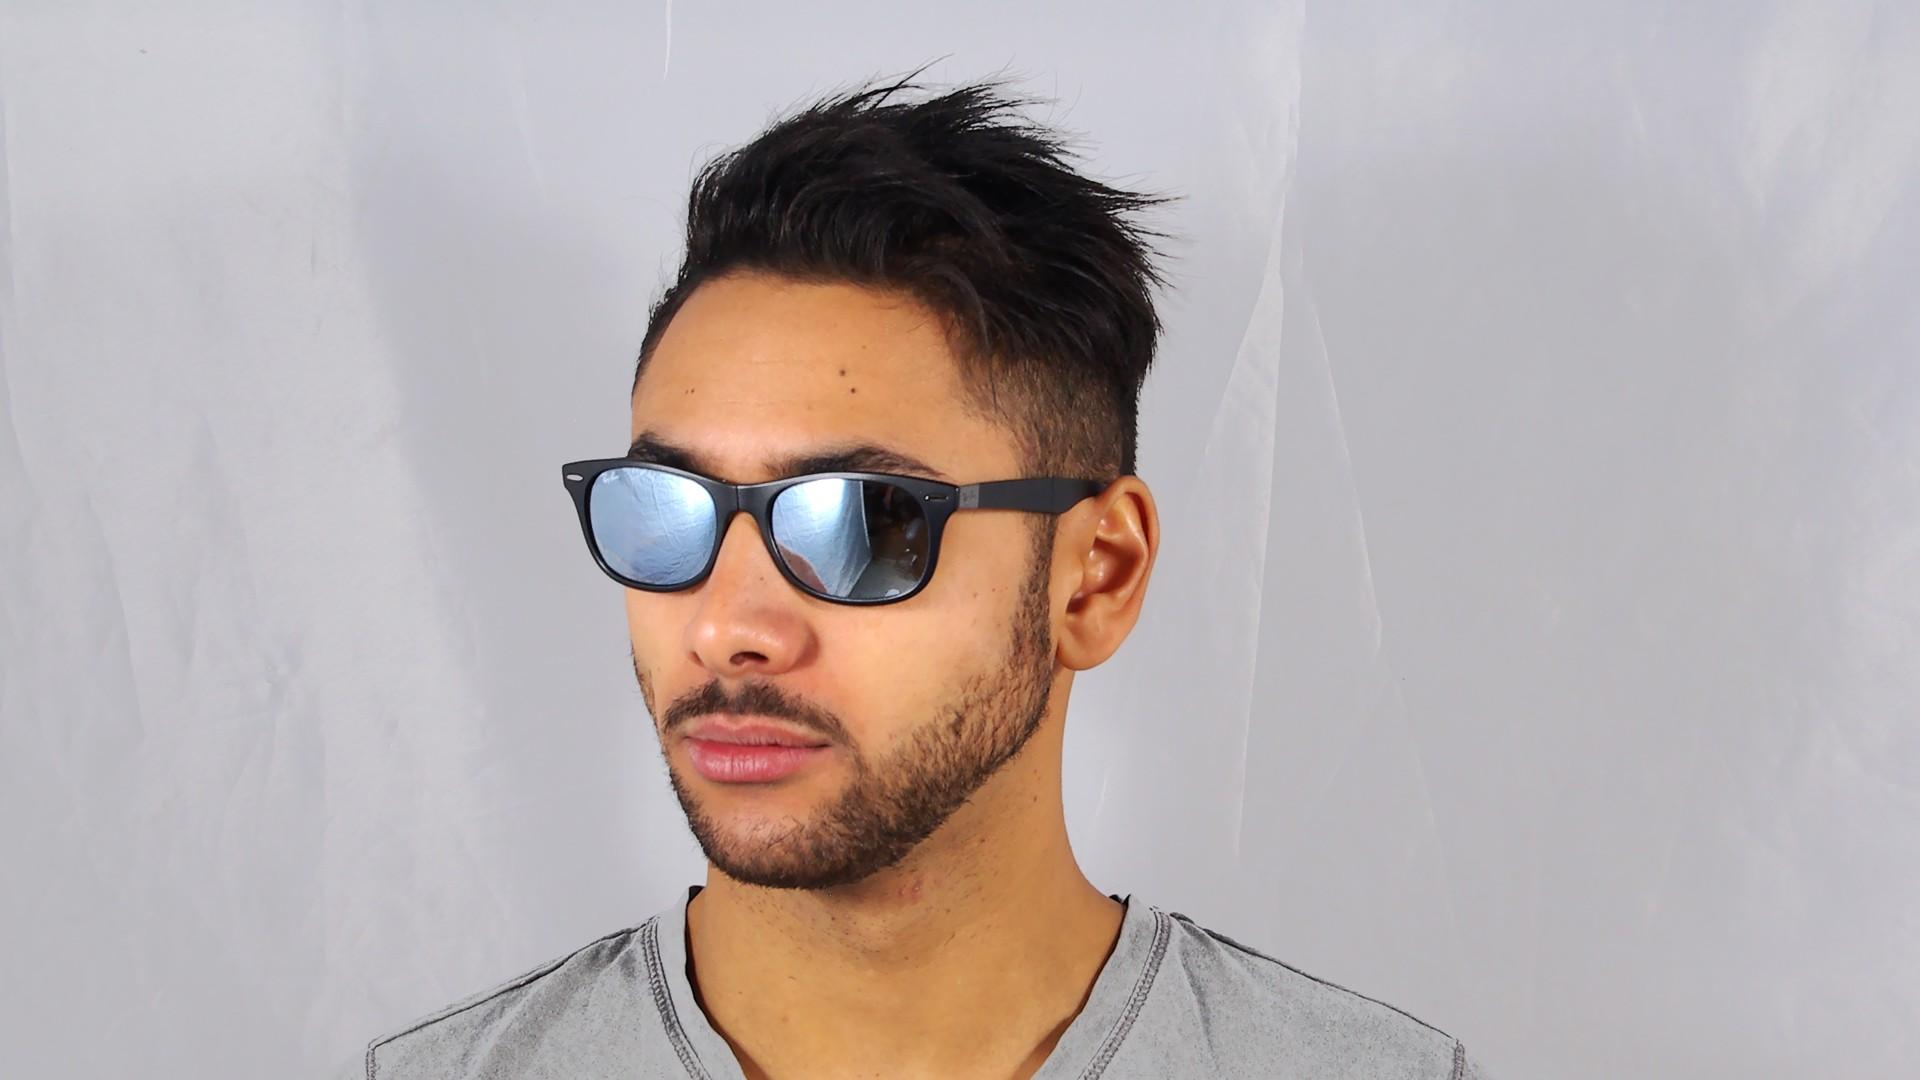 23b5a6adde9 Sunglasses Ray-Ban Erika Black RB4171 601 5Q 54-18 Medium Polarized